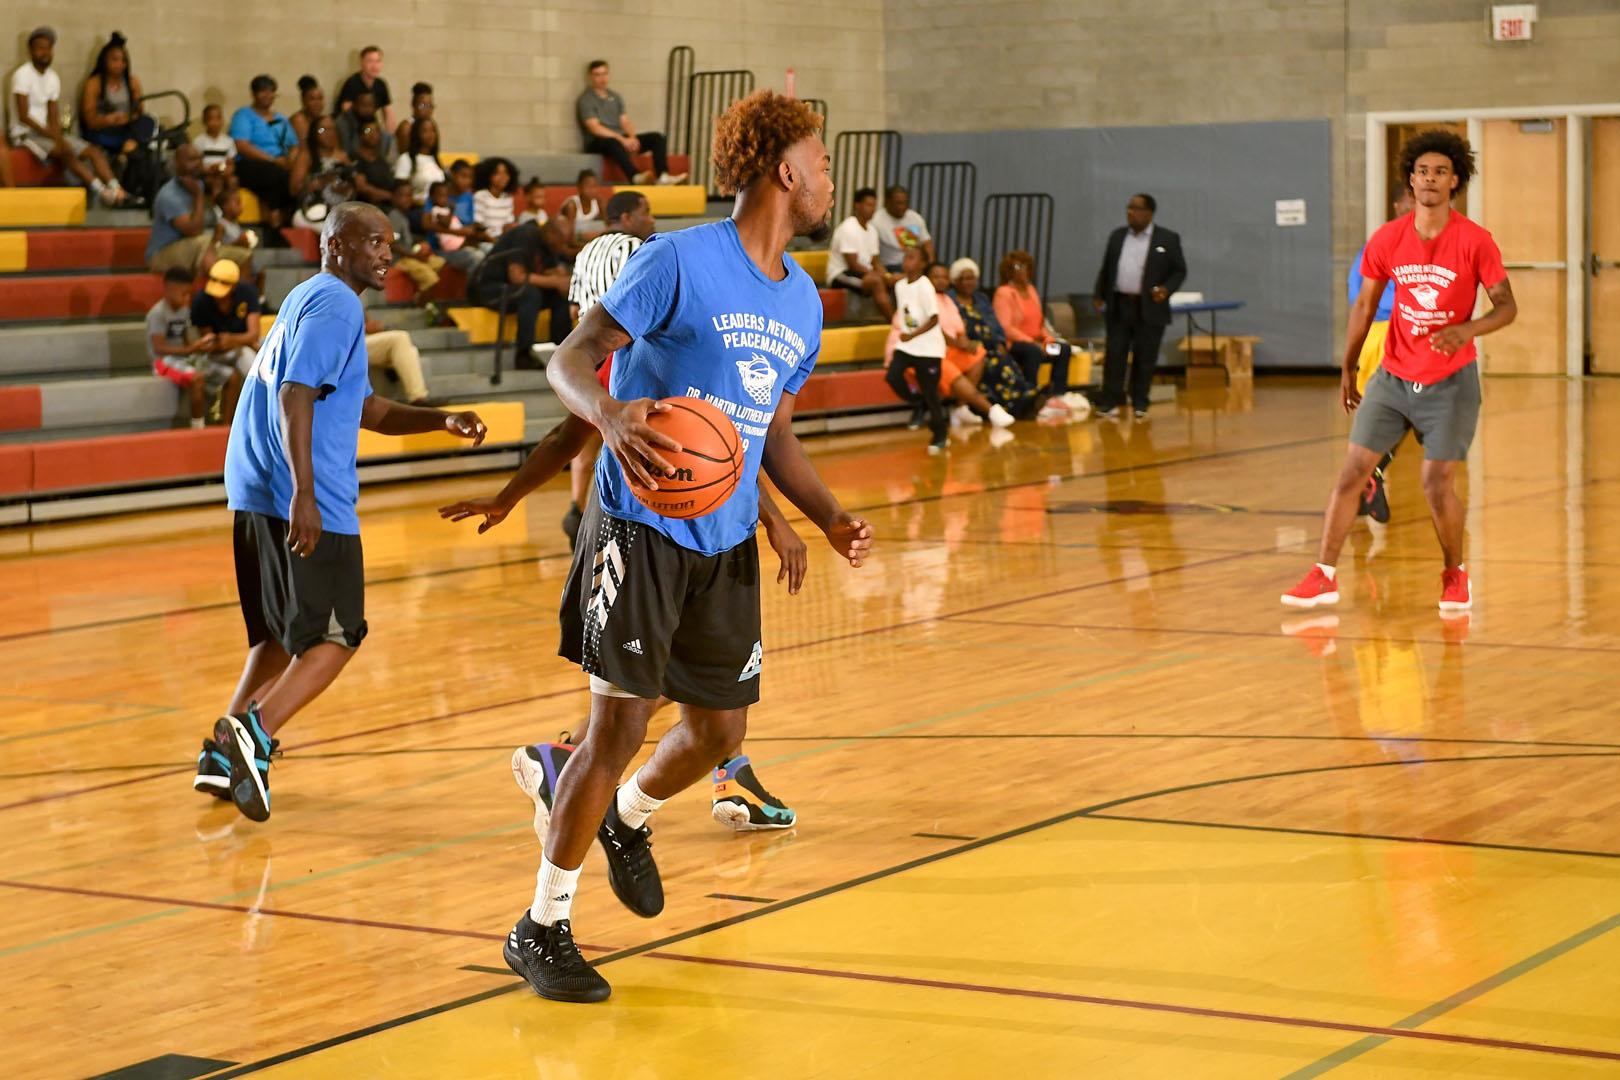 LNBasketball-30383.jpg